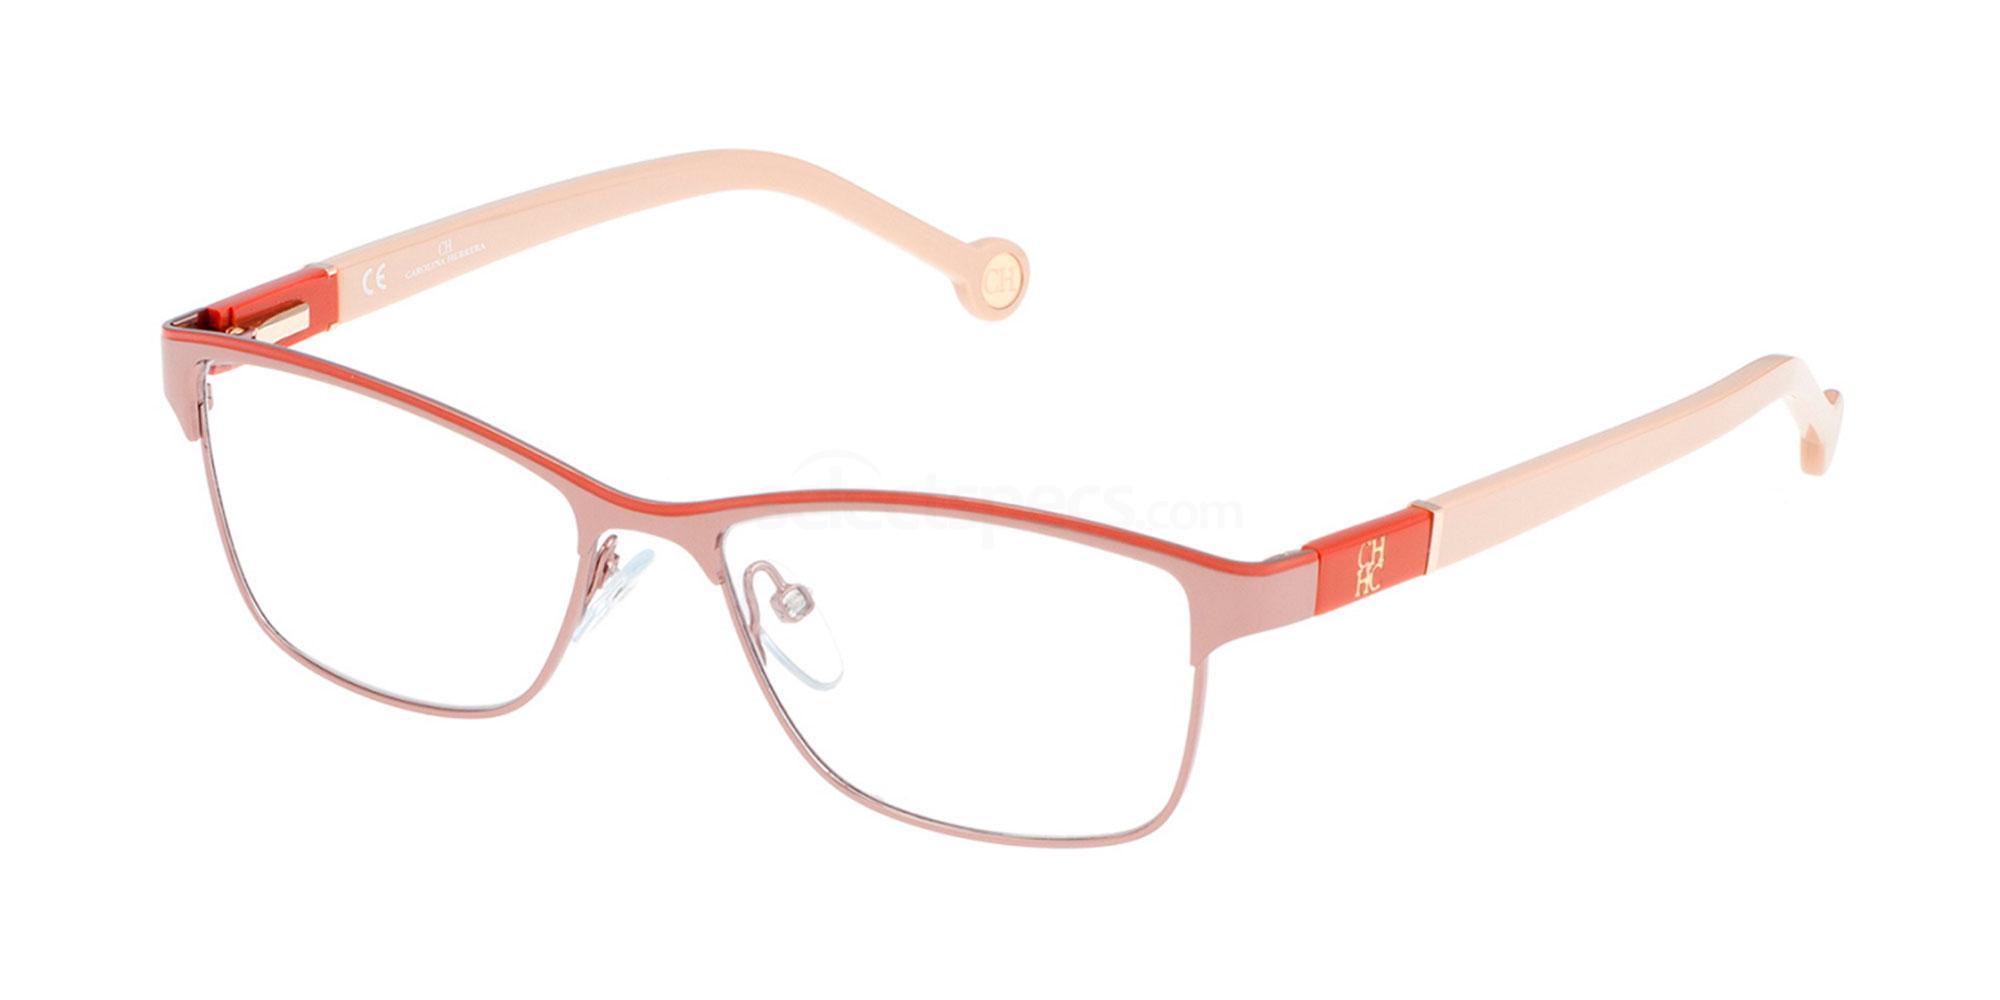 0R15 VHE053 Glasses, CH Carolina Herrera